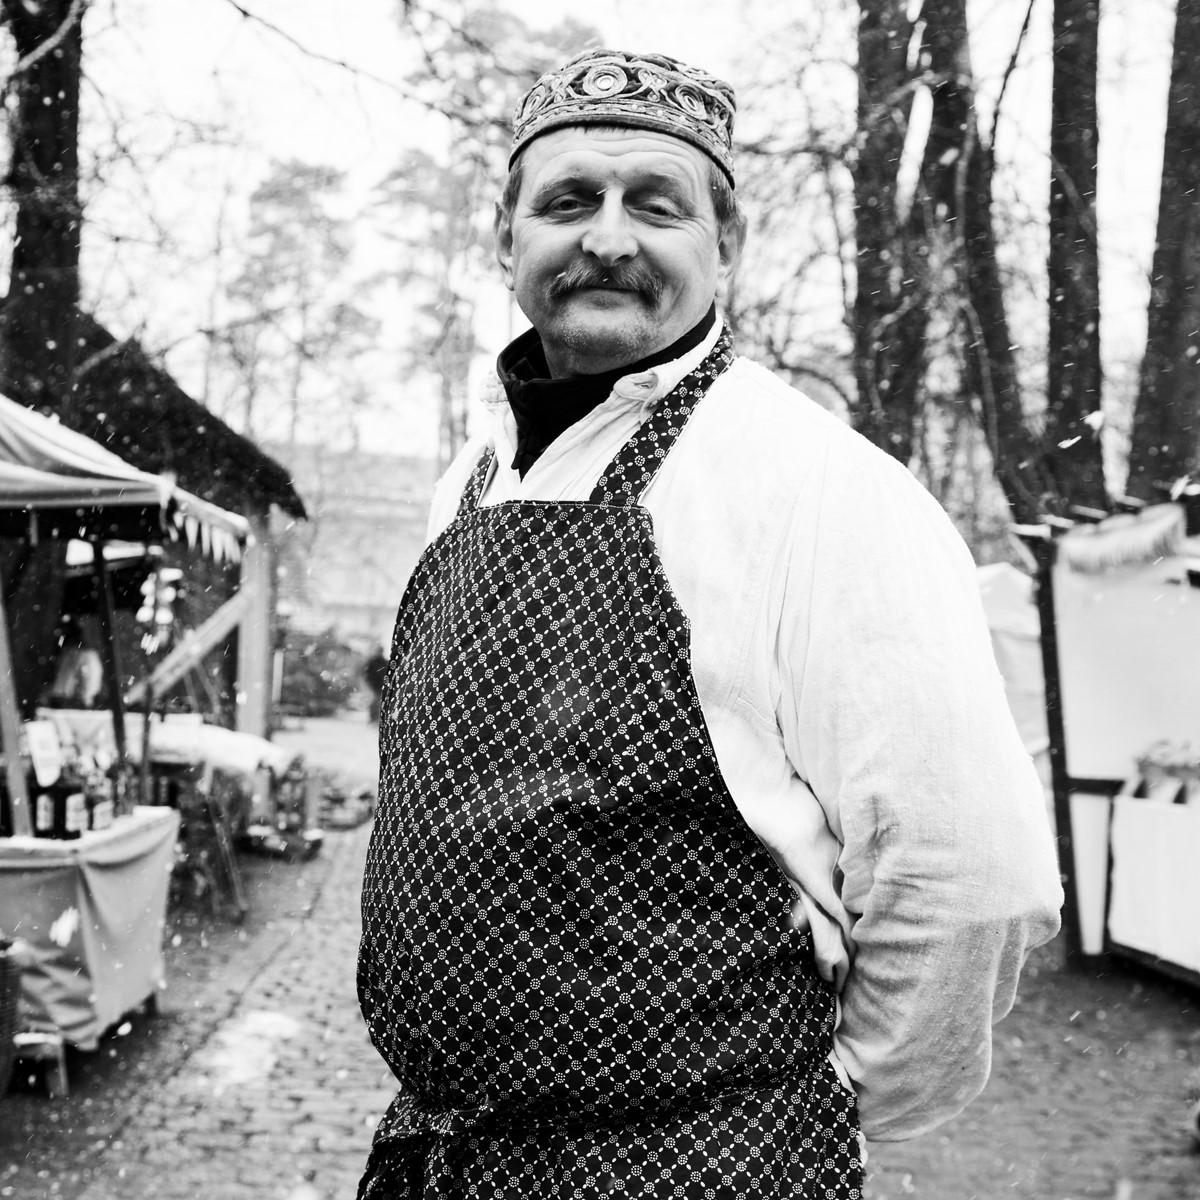 Josef Sir Piras (Kopírovat)